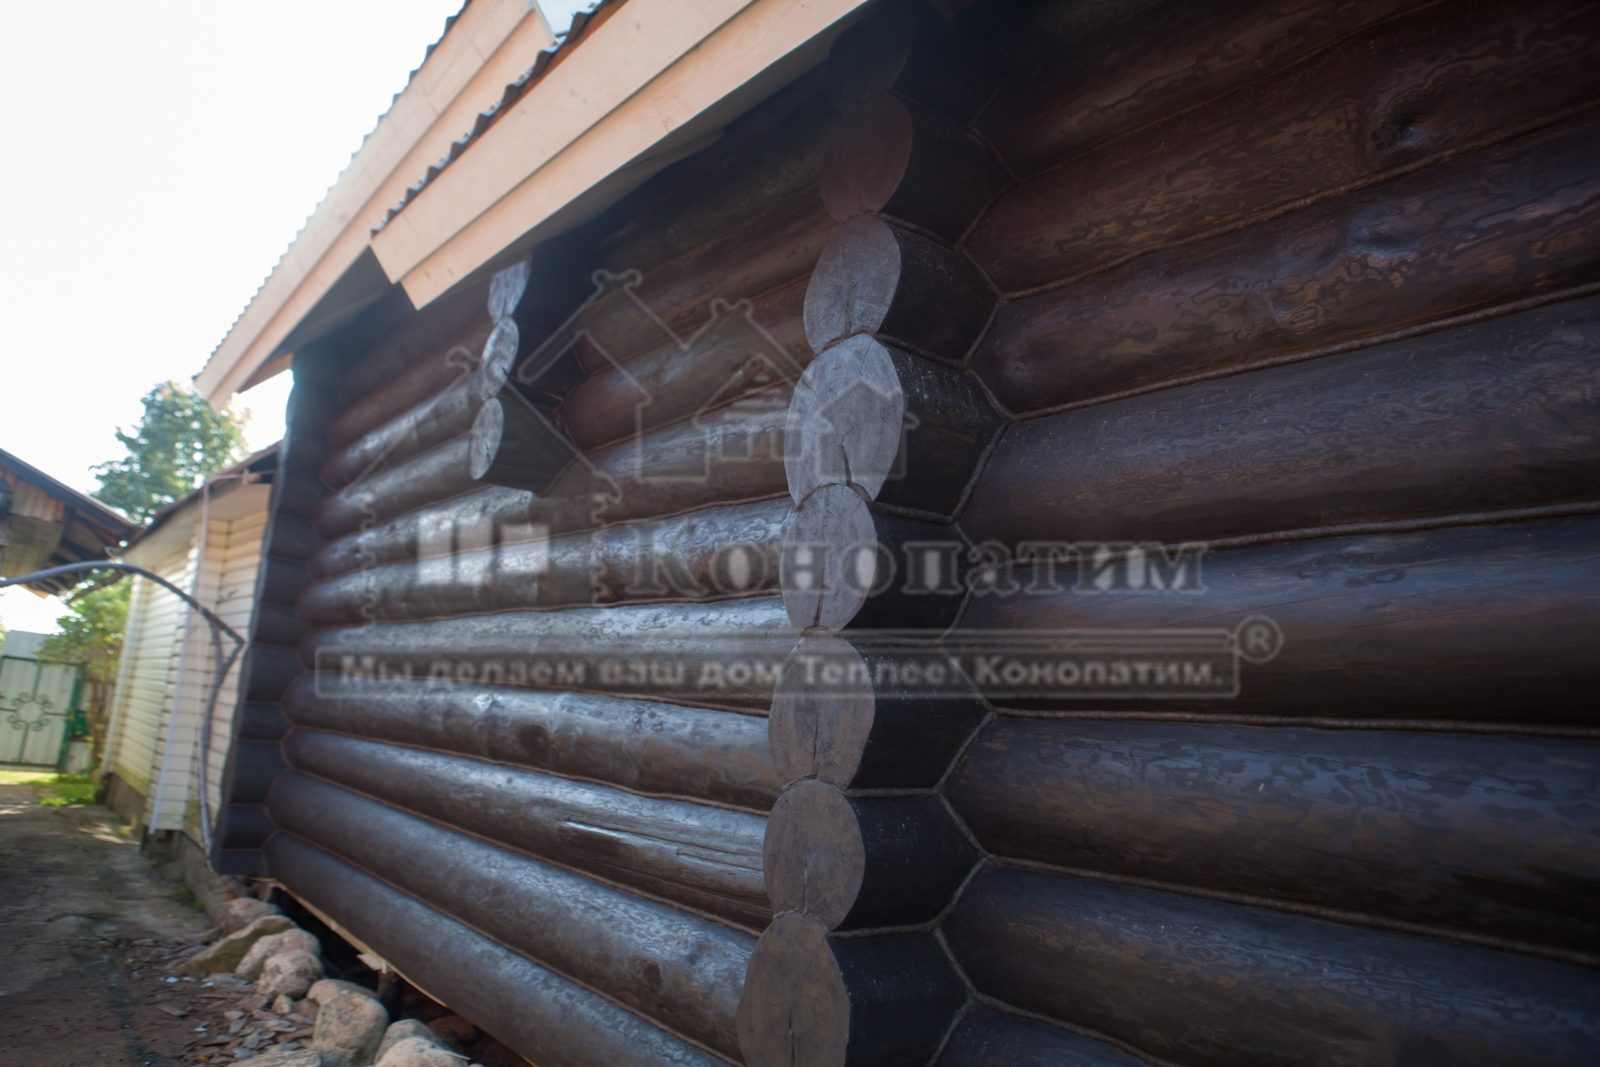 Фото-внешняя покраска и конопатка стен деревянного сруба в районе Пос. Куровицы.